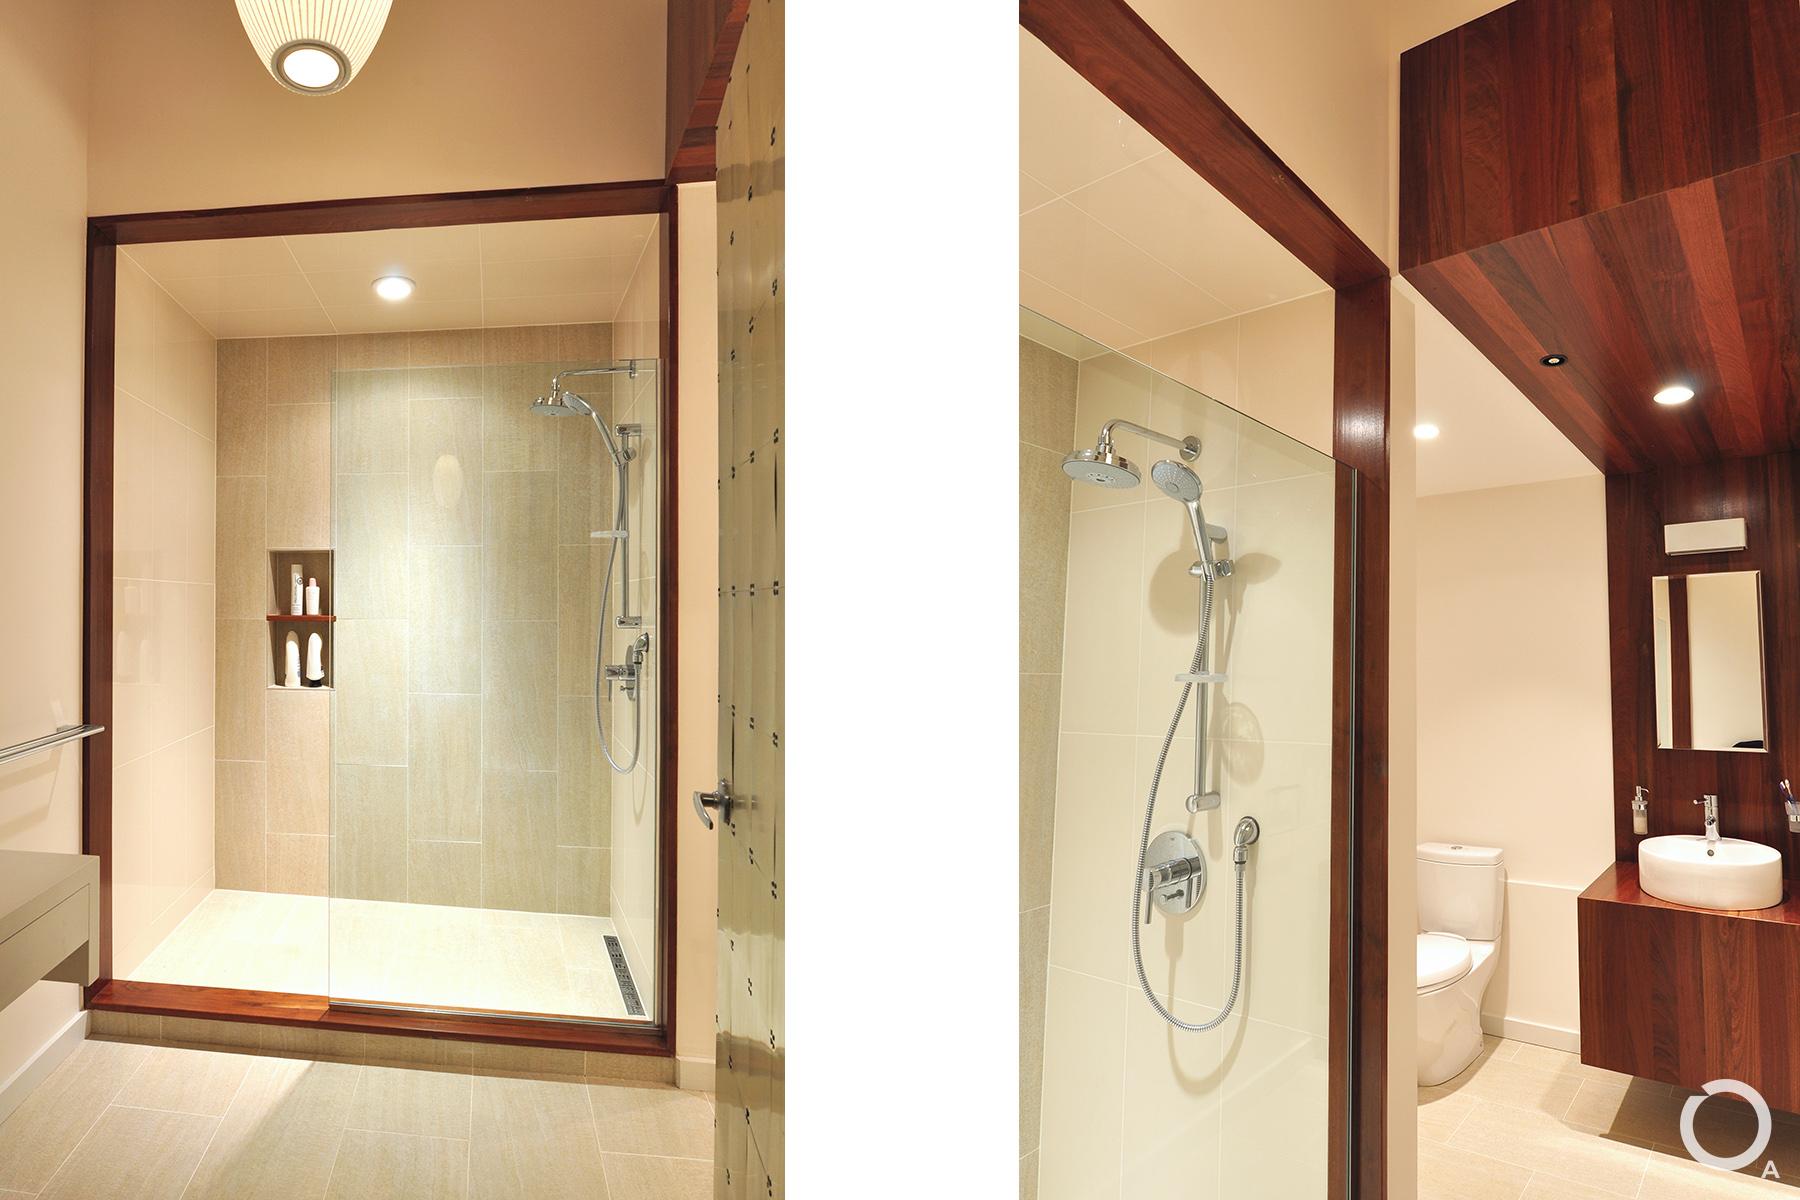 G1 (Leather District Loft Renovation Boston Architect Interior Designer).jpg